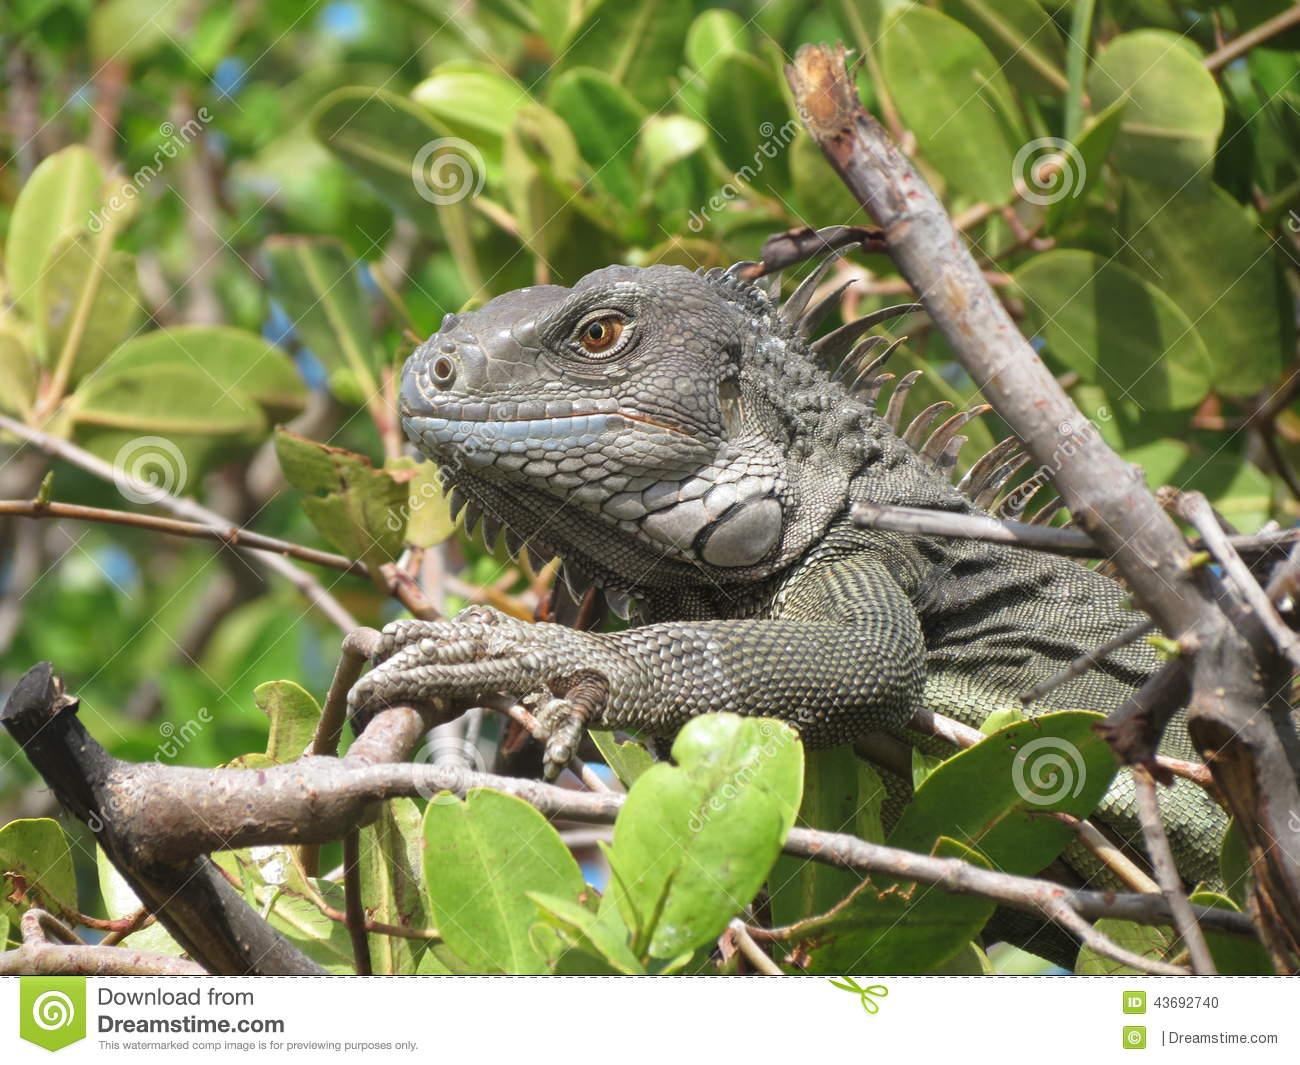 Head View Of A Green Common Iguana Reptile Dragon Lizard Stock.